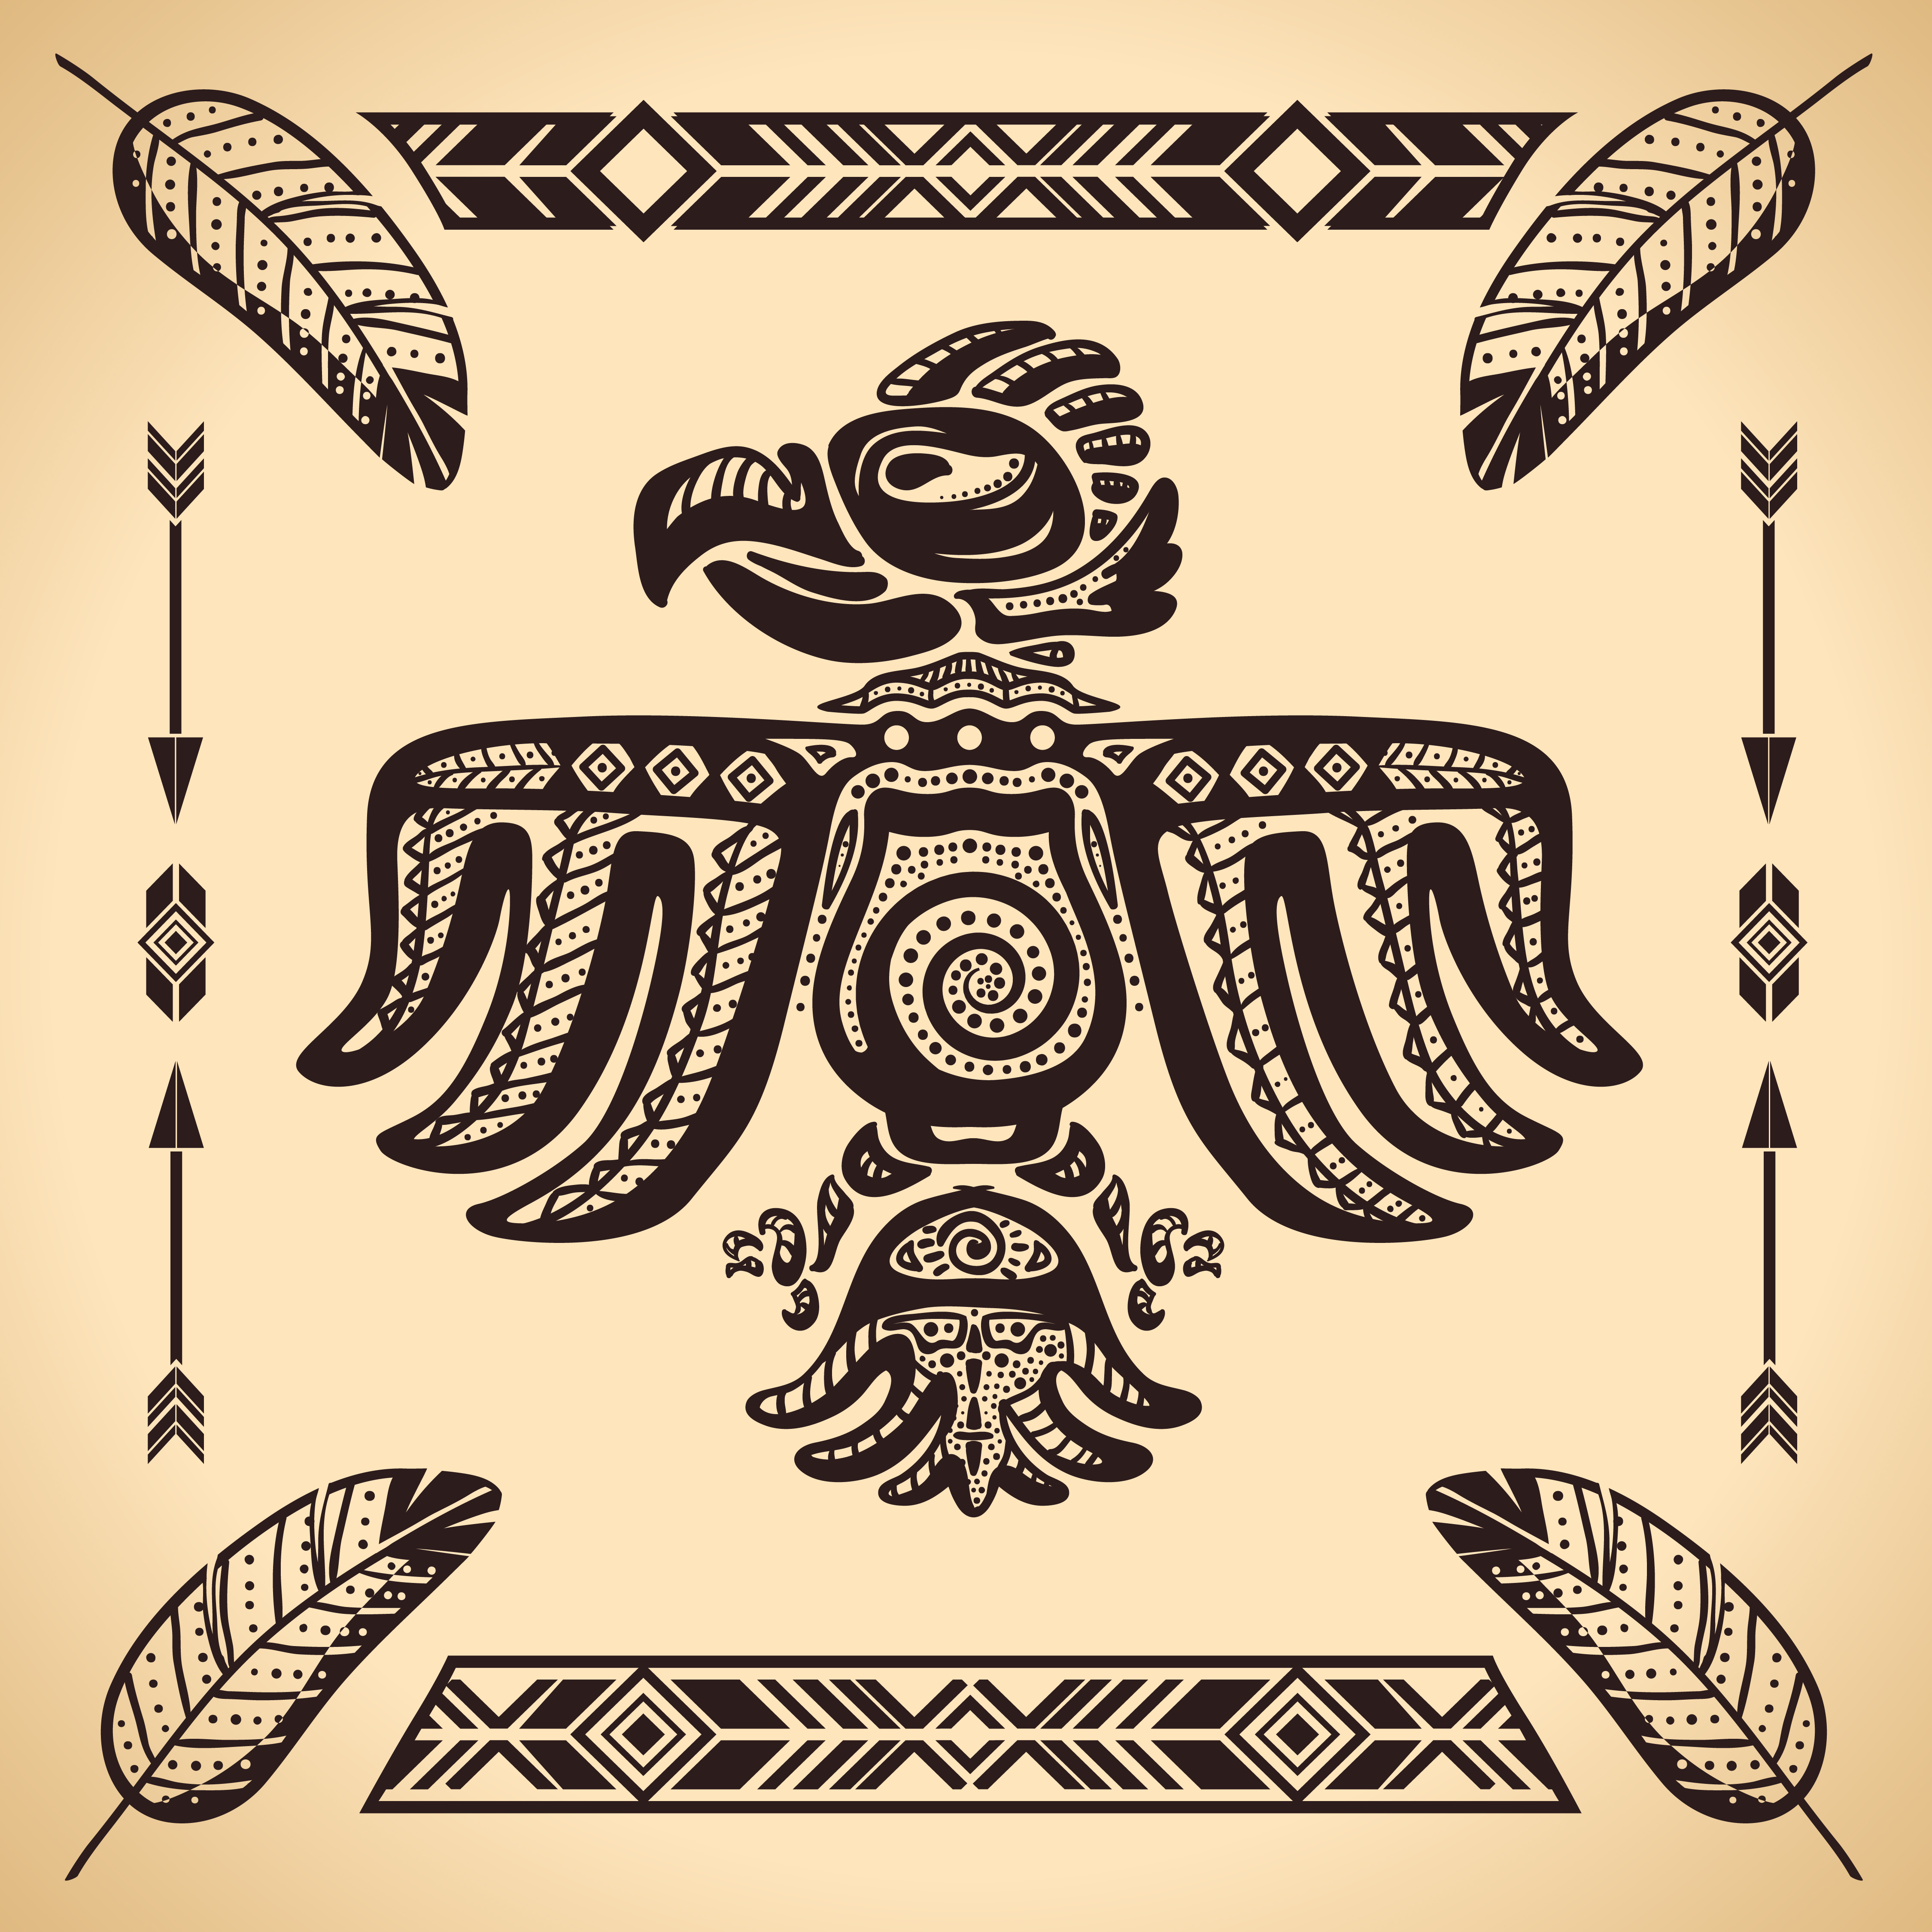 Native American Legends: The Wendigo